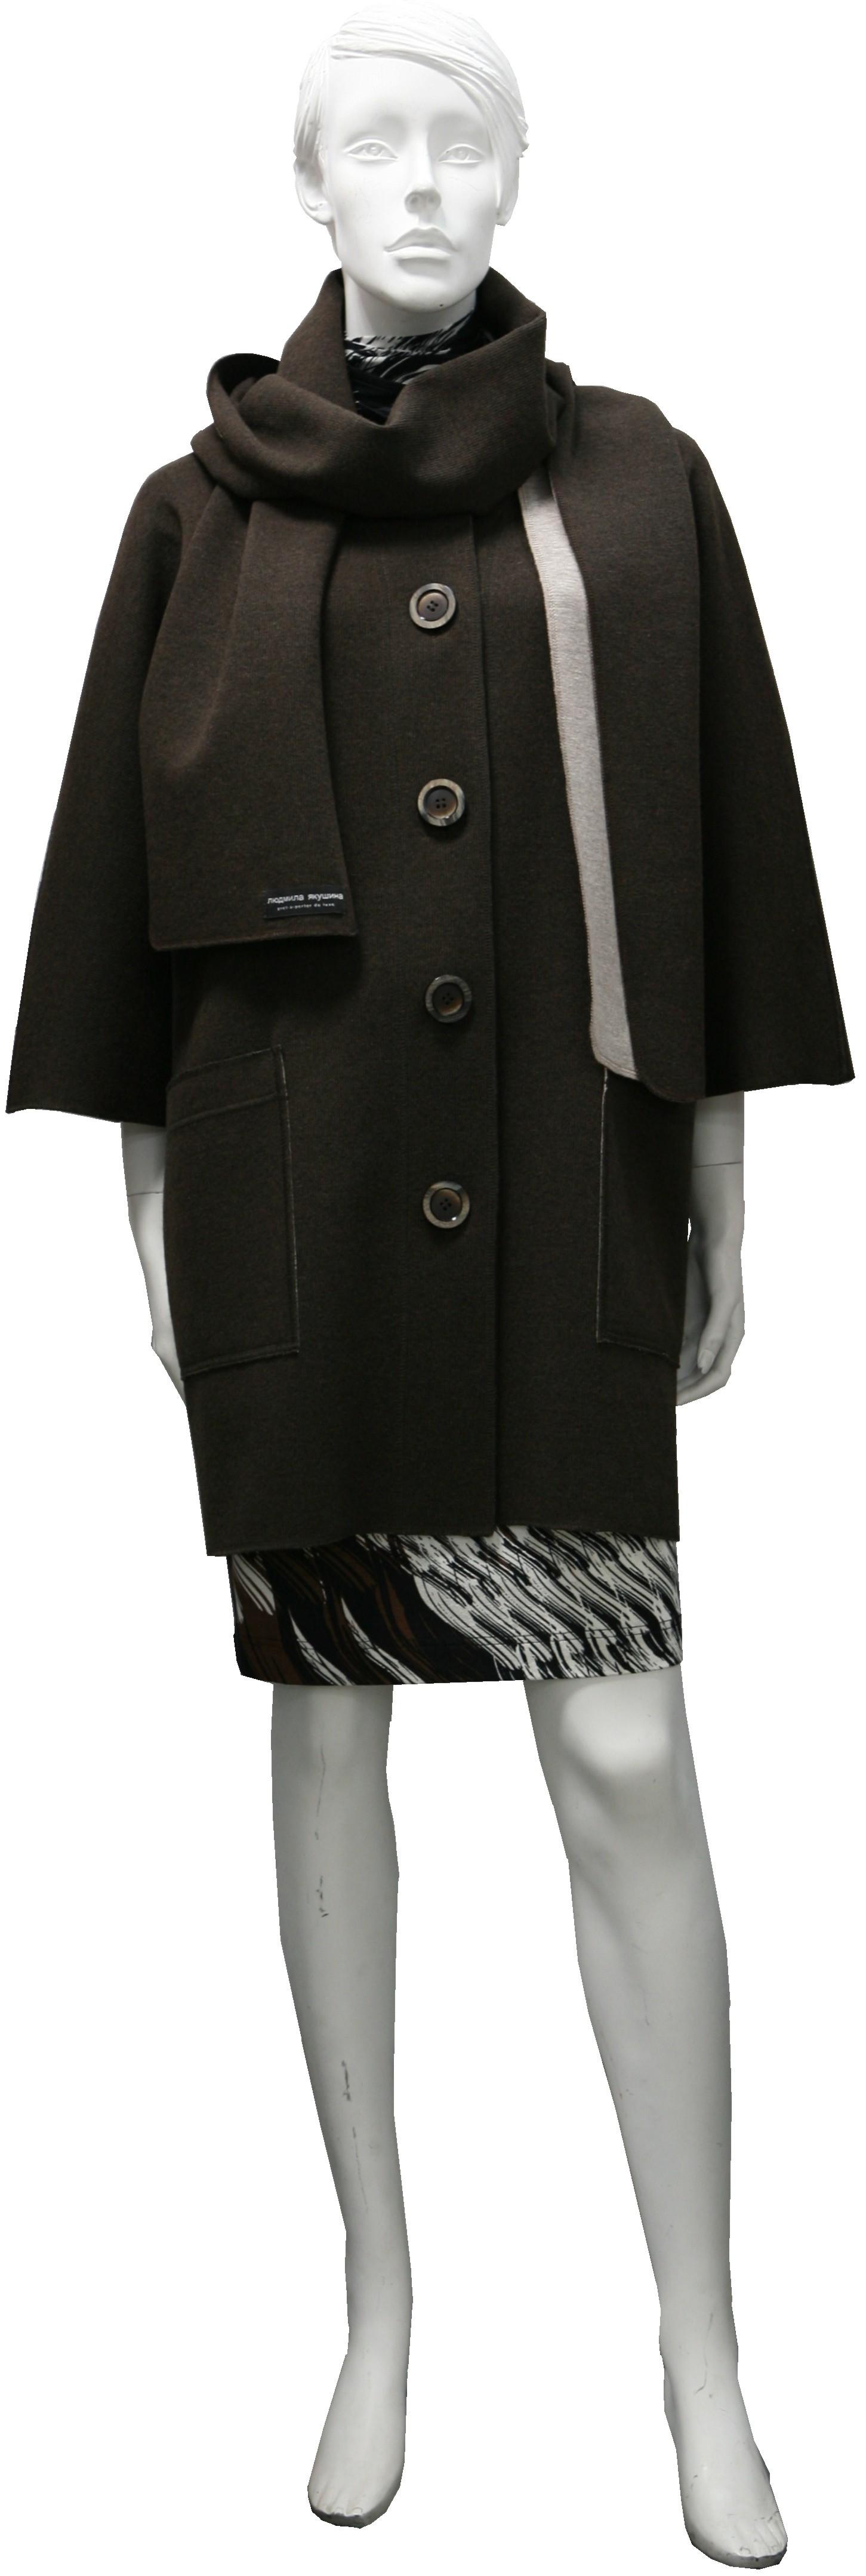 2052 184 500 пальто (20500).